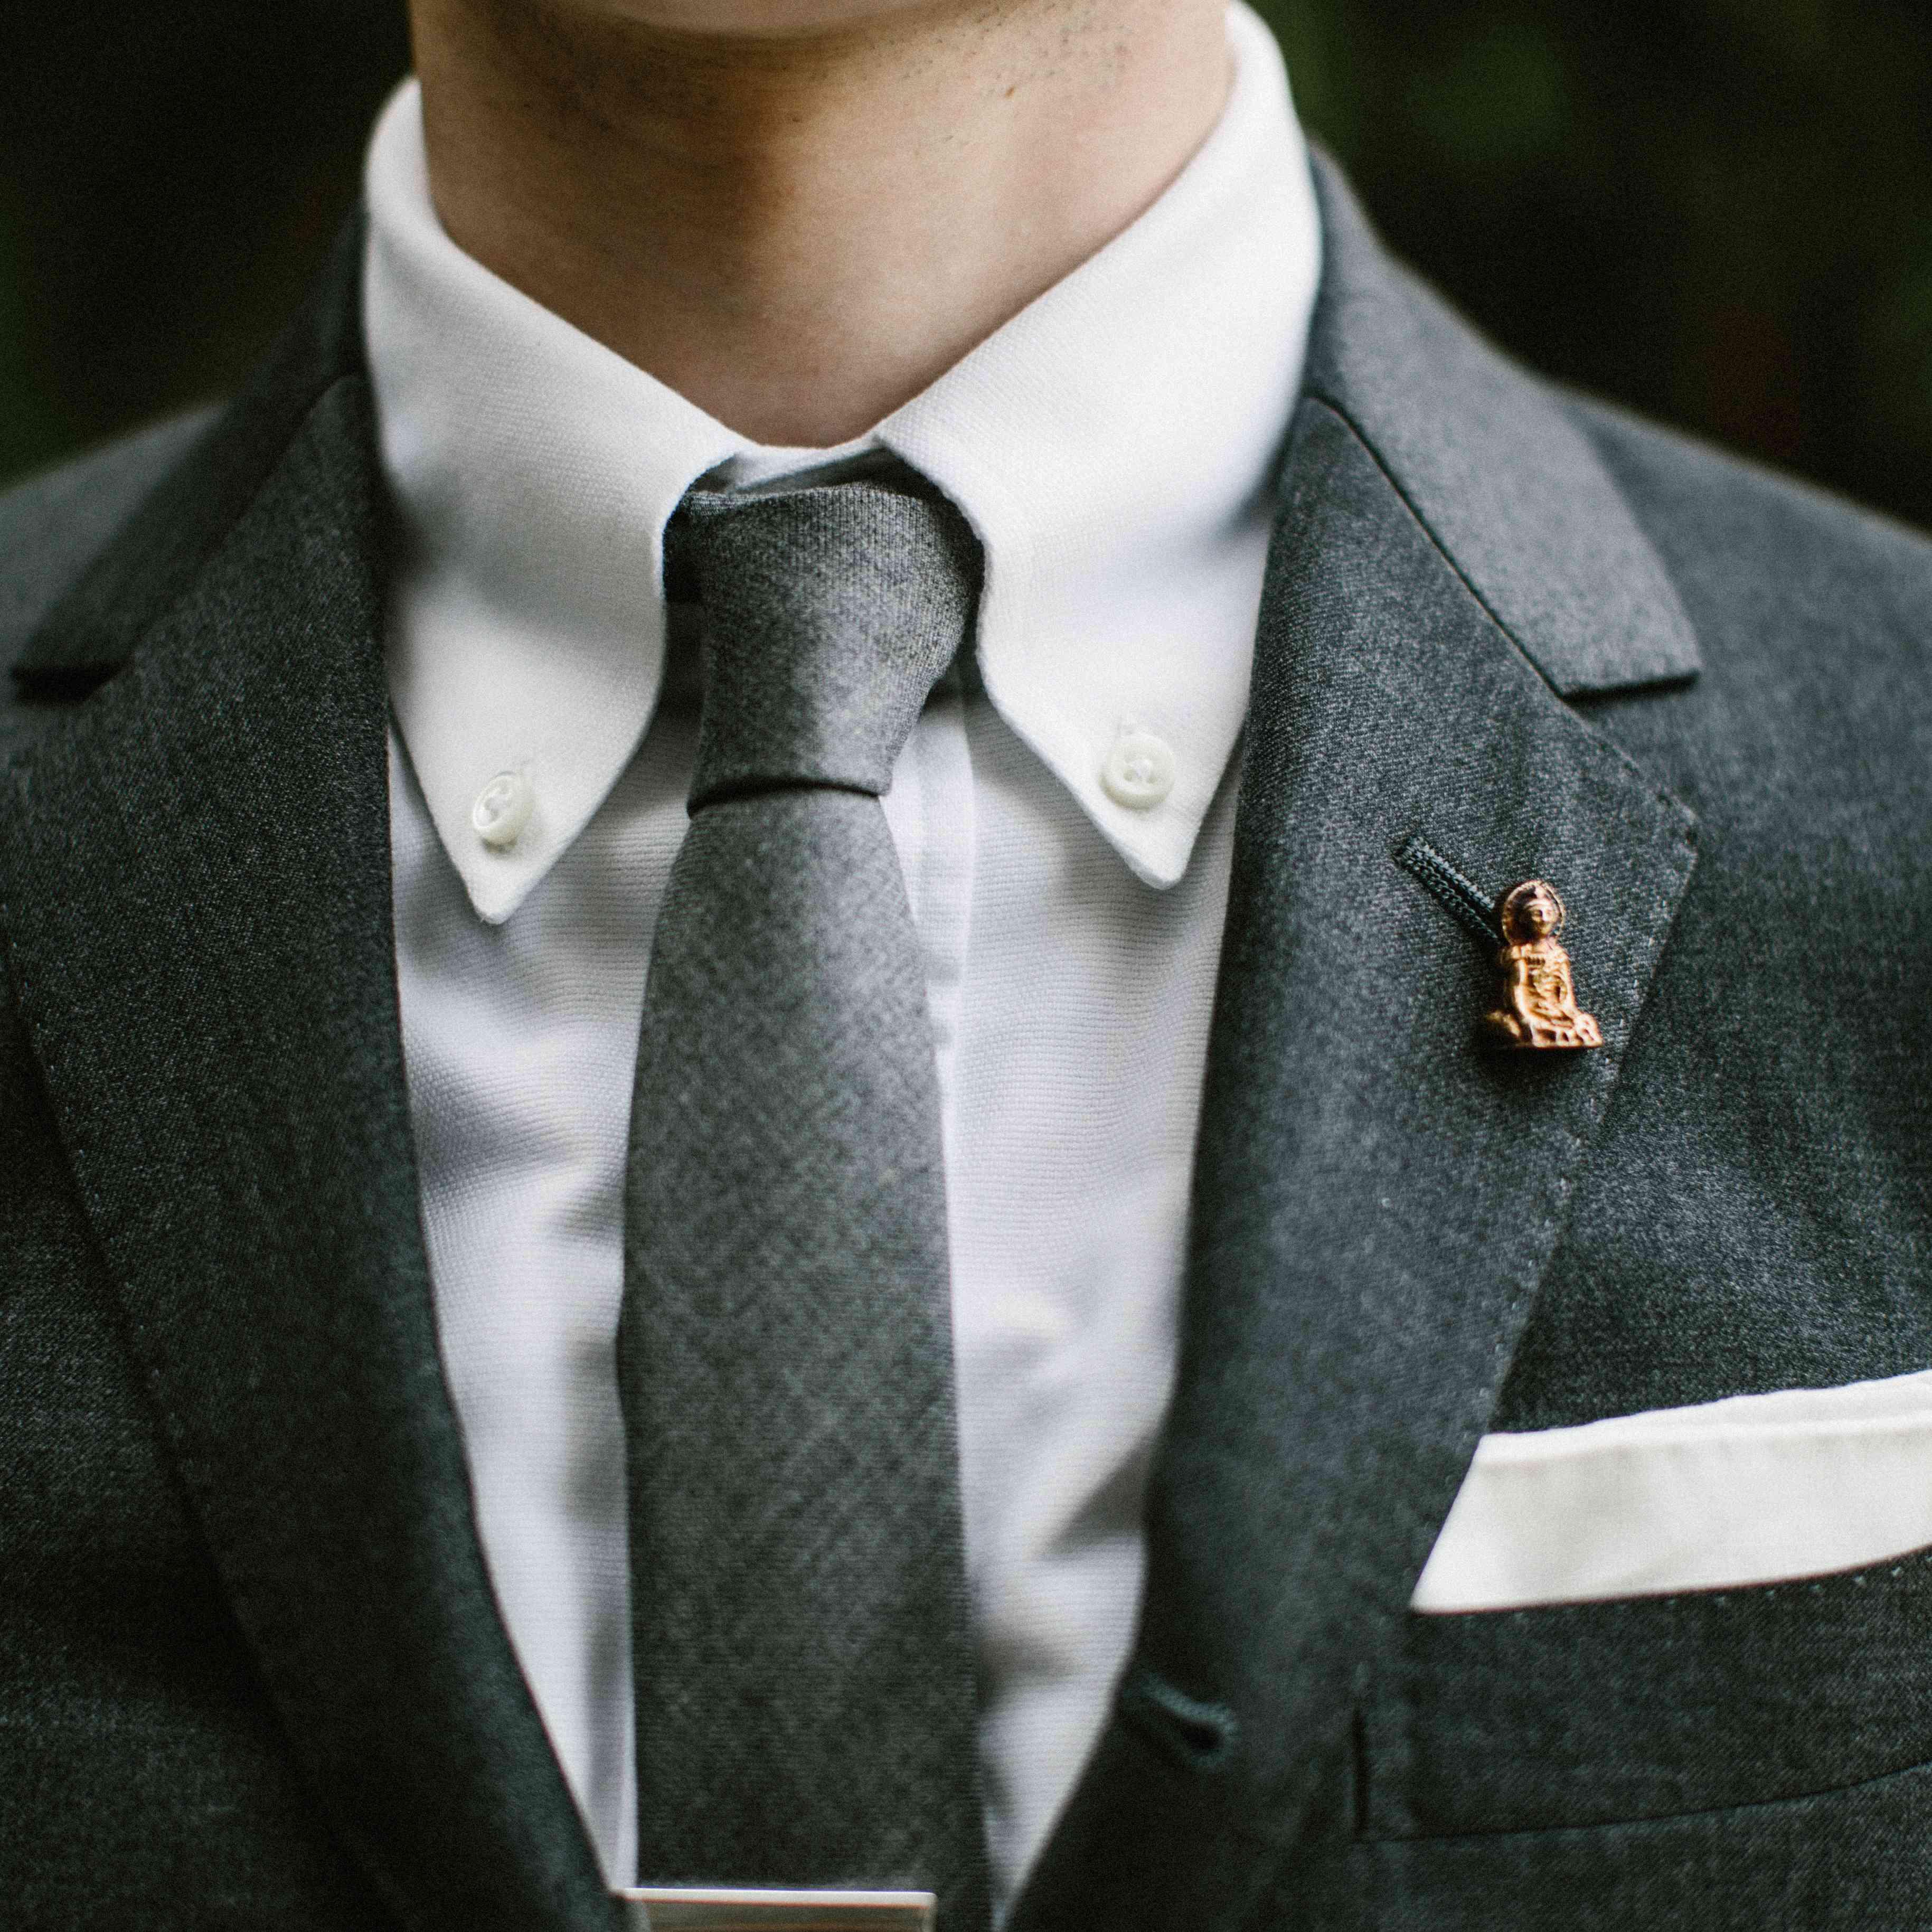 Groom tie close-up